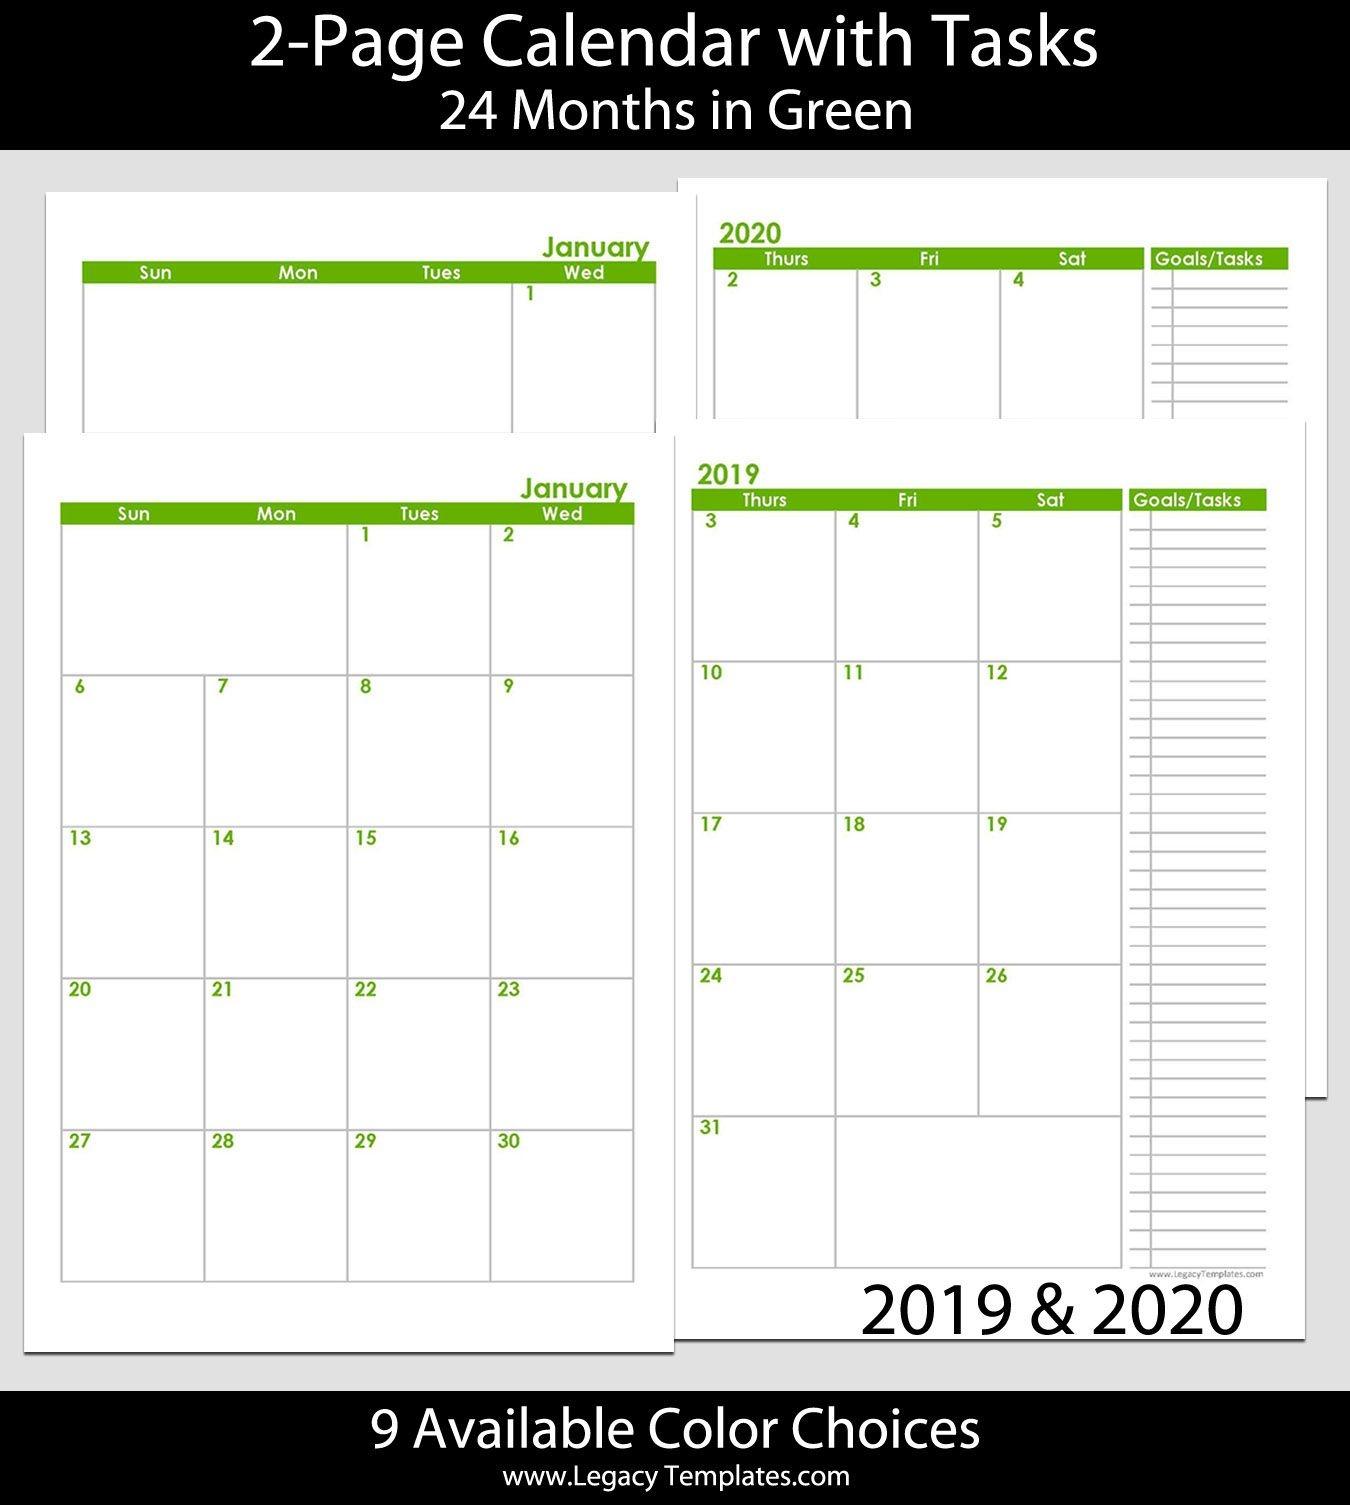 2019 & 2020 24 Months 2 Page Calendar – A5 | Legacy Templates